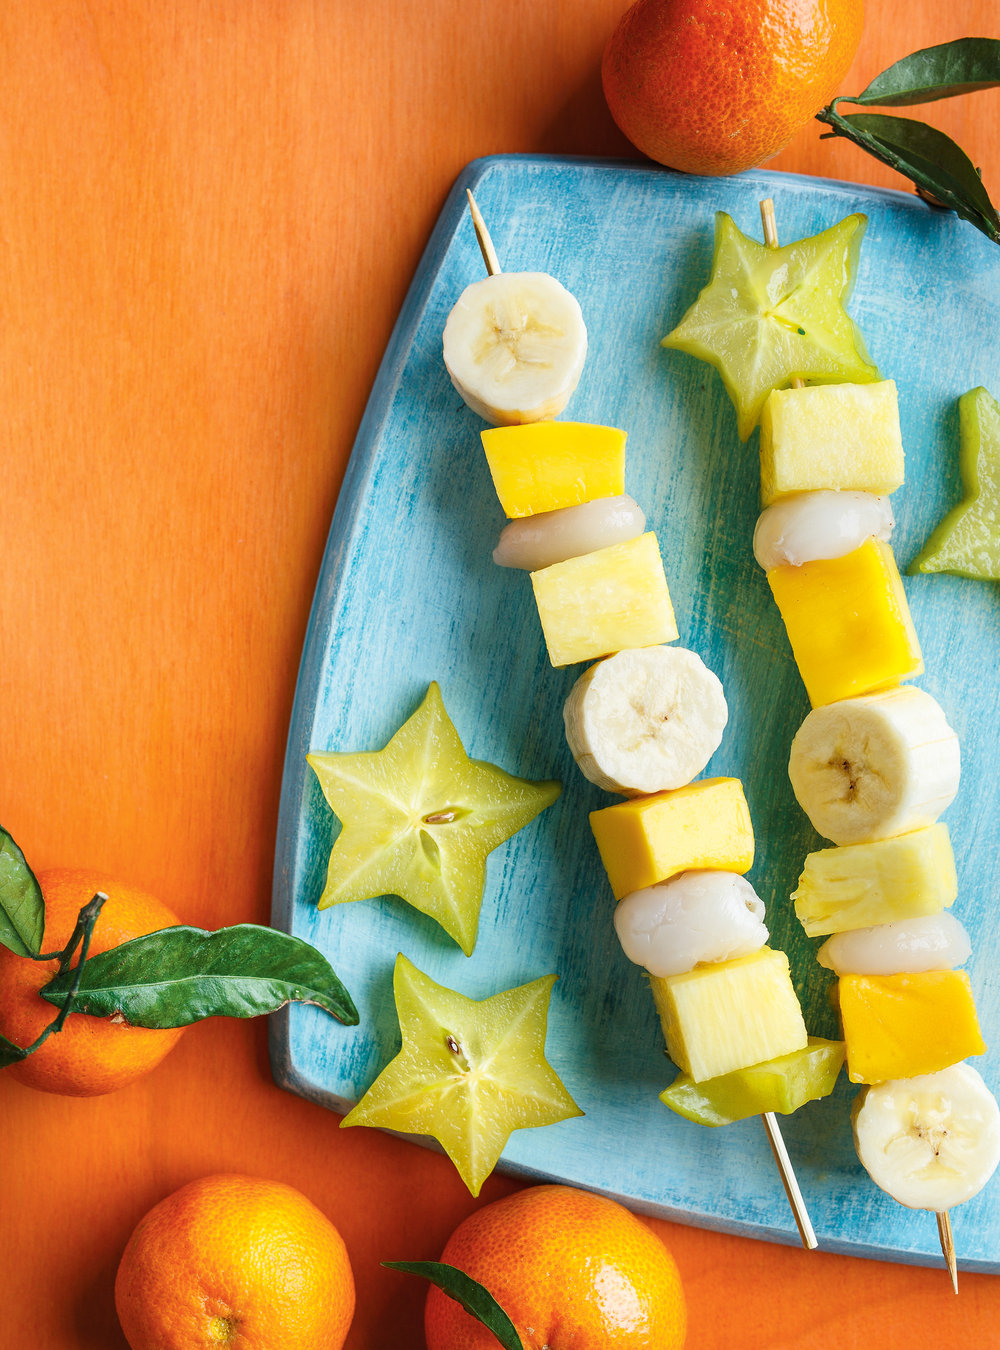 Idee De Brochette.Brochette De Fruits Exotiques